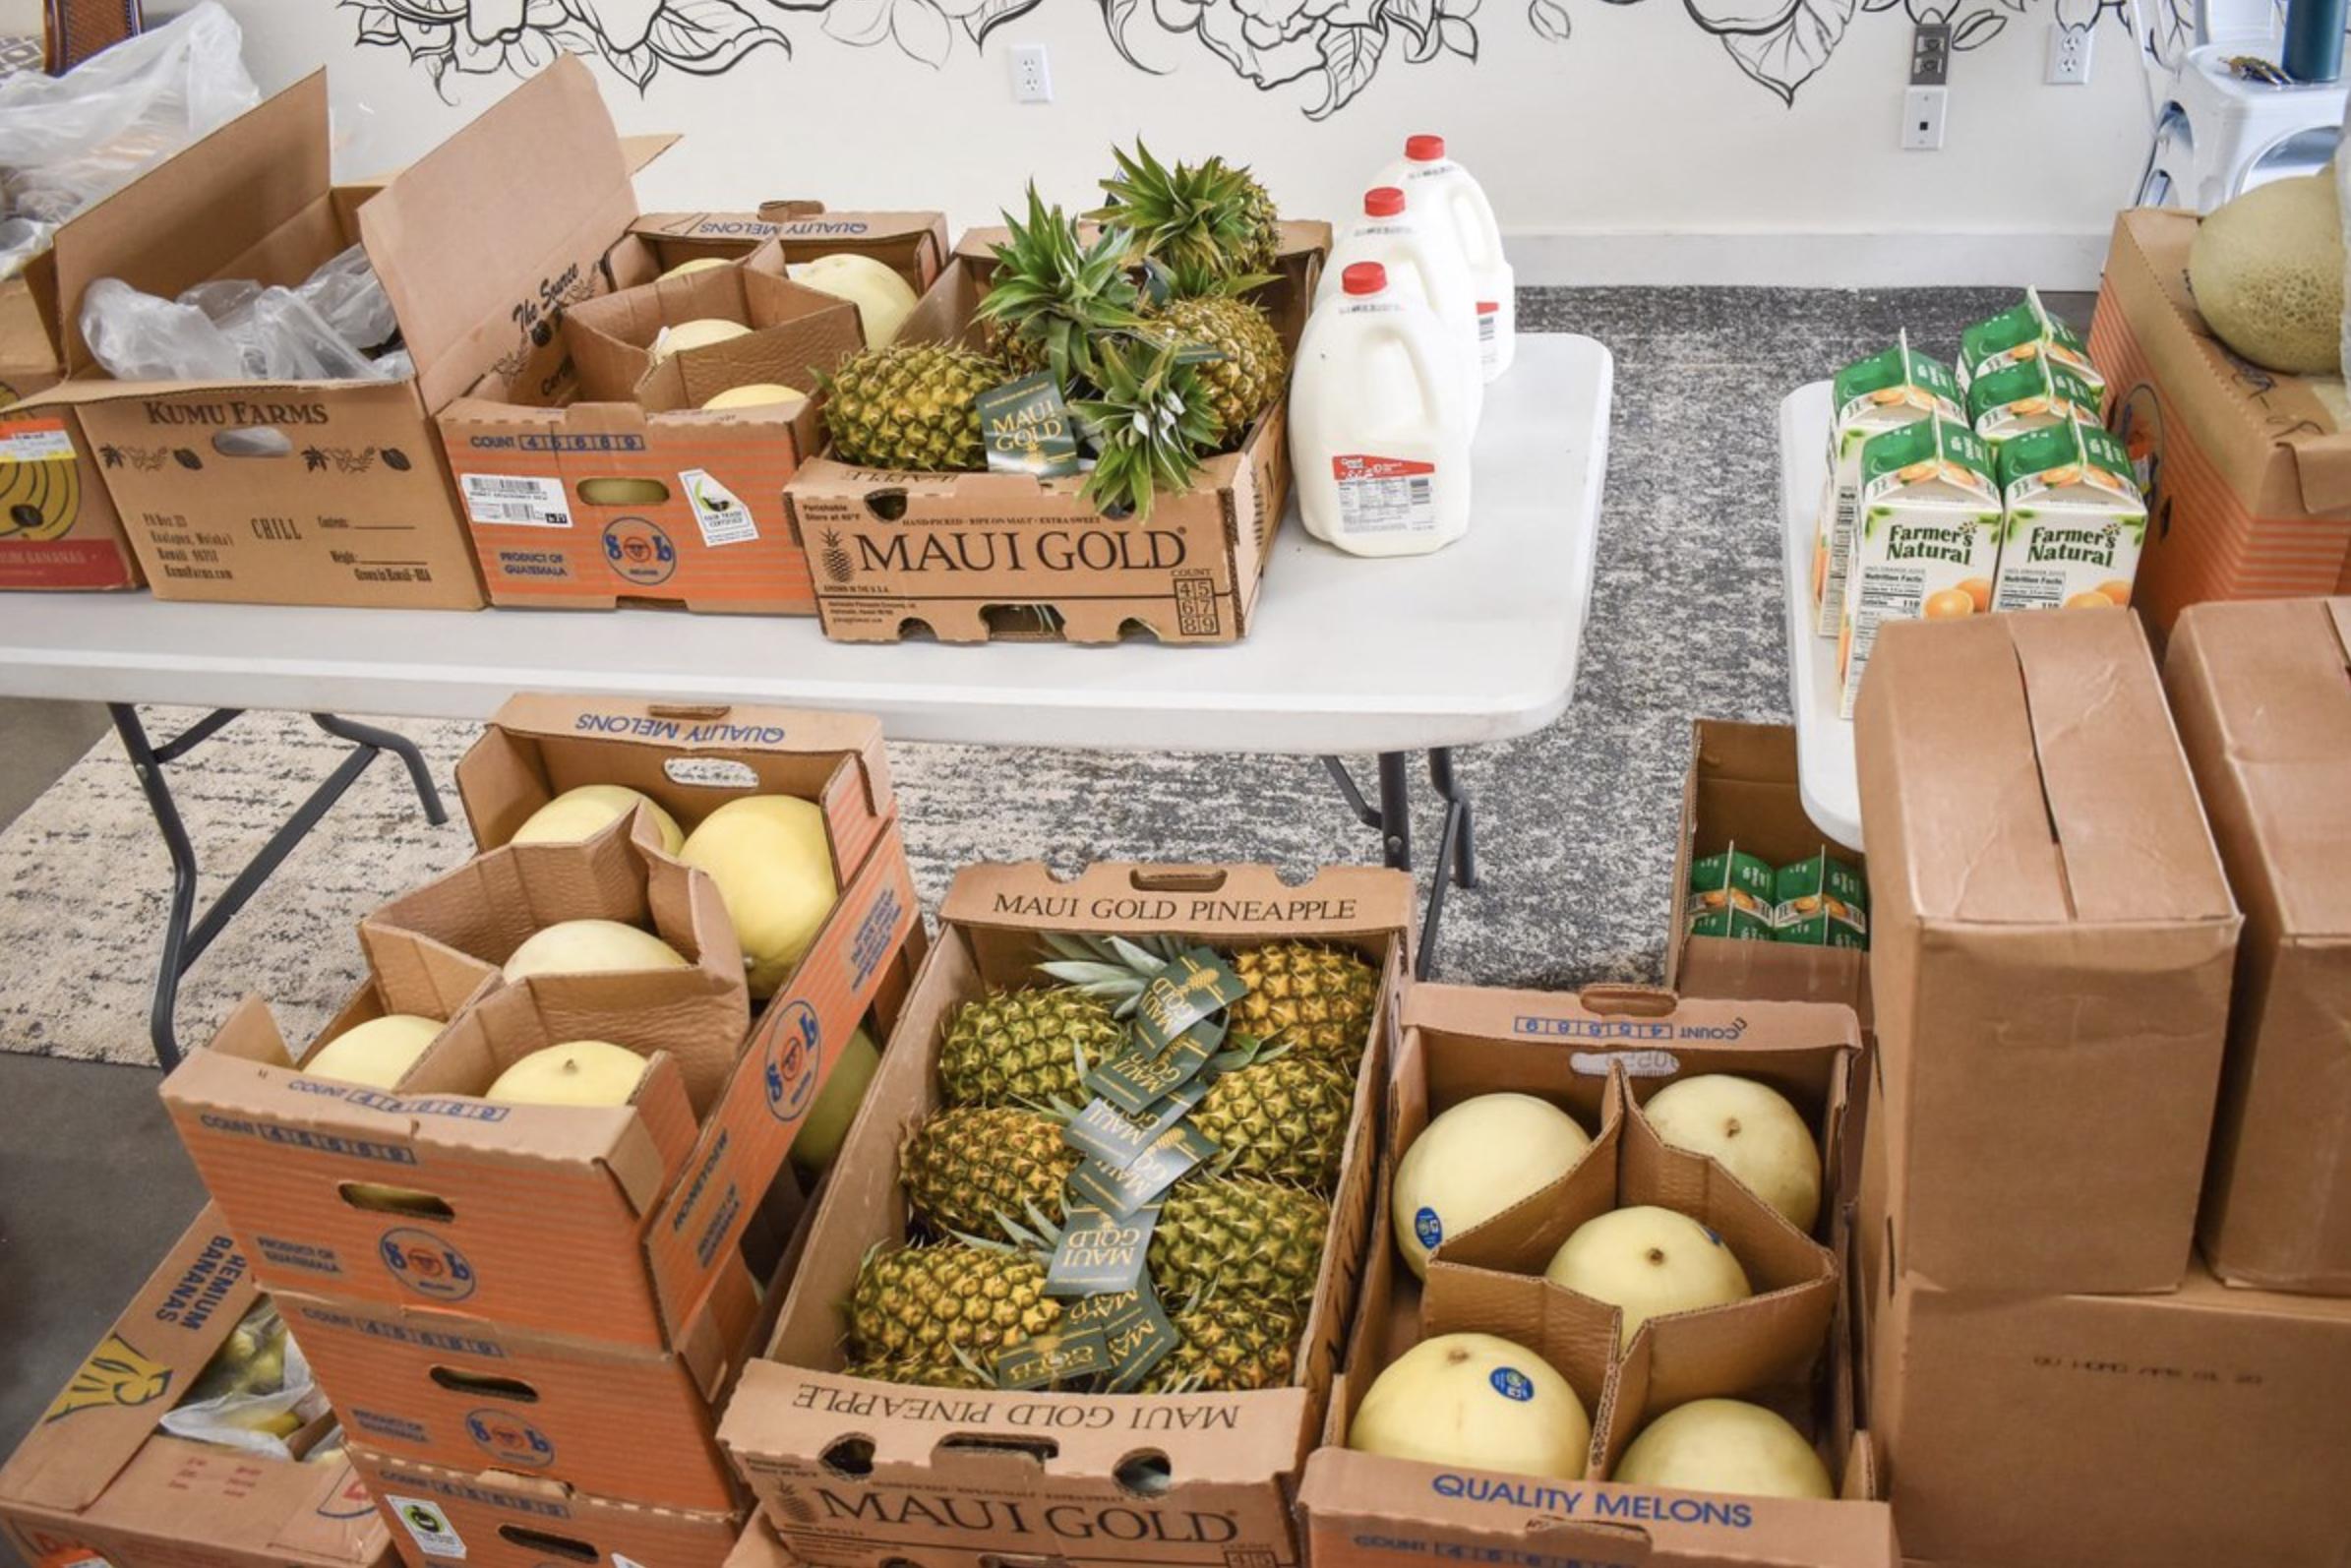 Kaiser Permanente Hawai'i Grants Aim to Address Food Insecurity on Maui